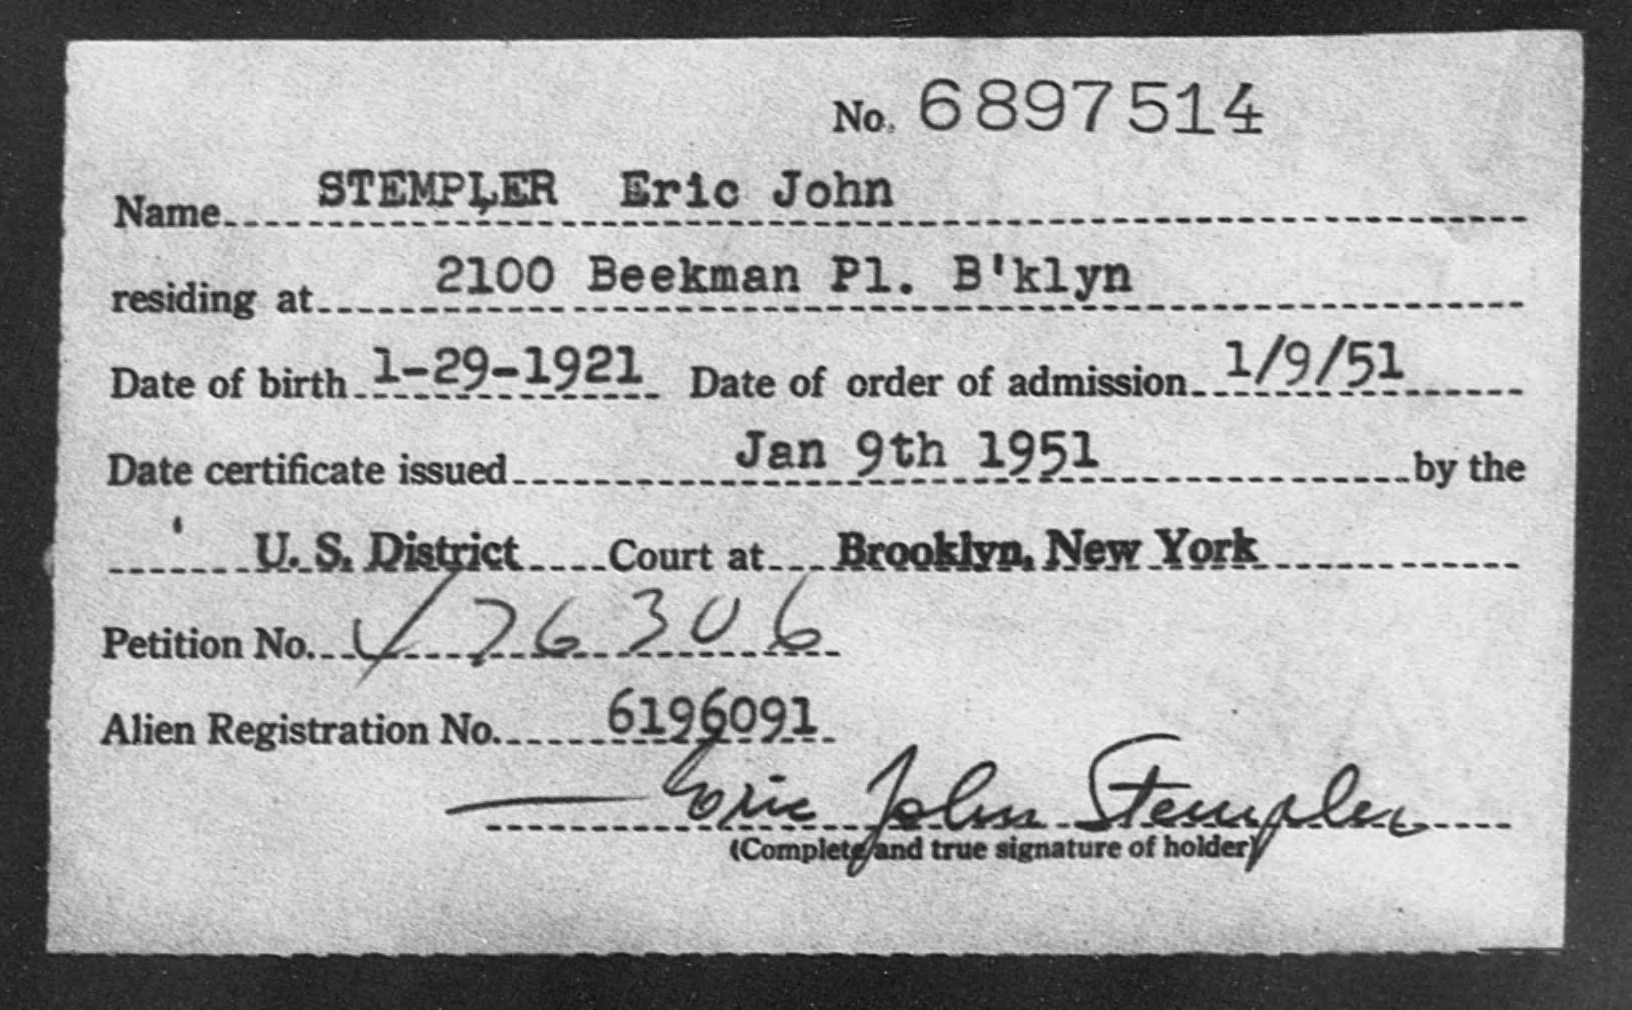 STEMPLER Eric John - Born: 1921, Naturalized: 1951